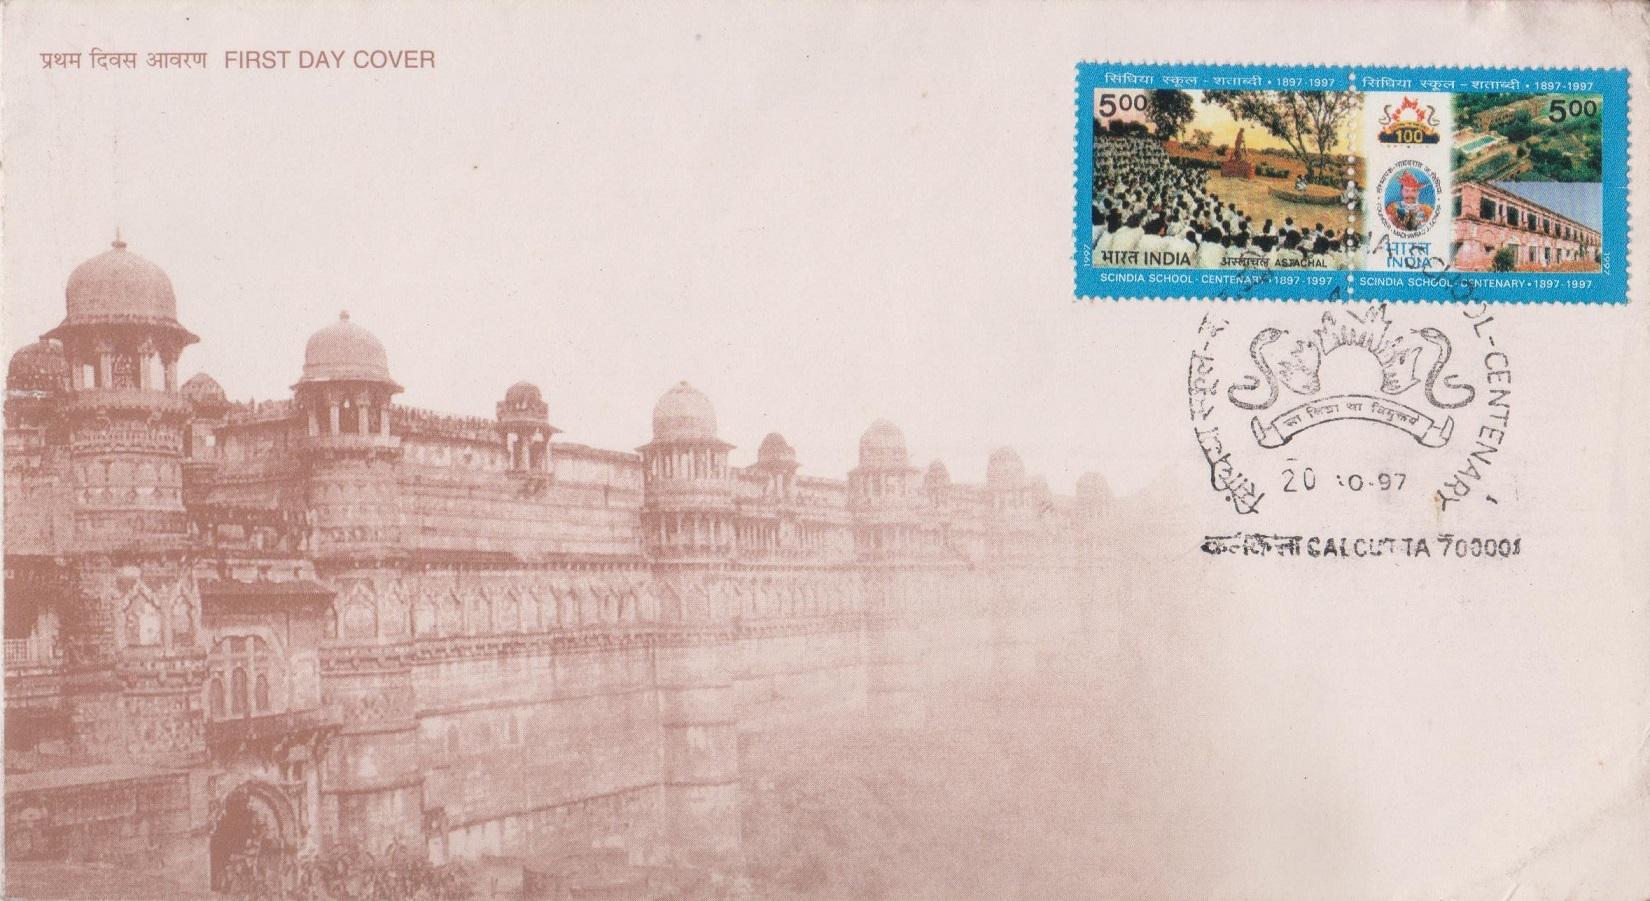 Gwalior Fort (ग्वालियर क़िला)